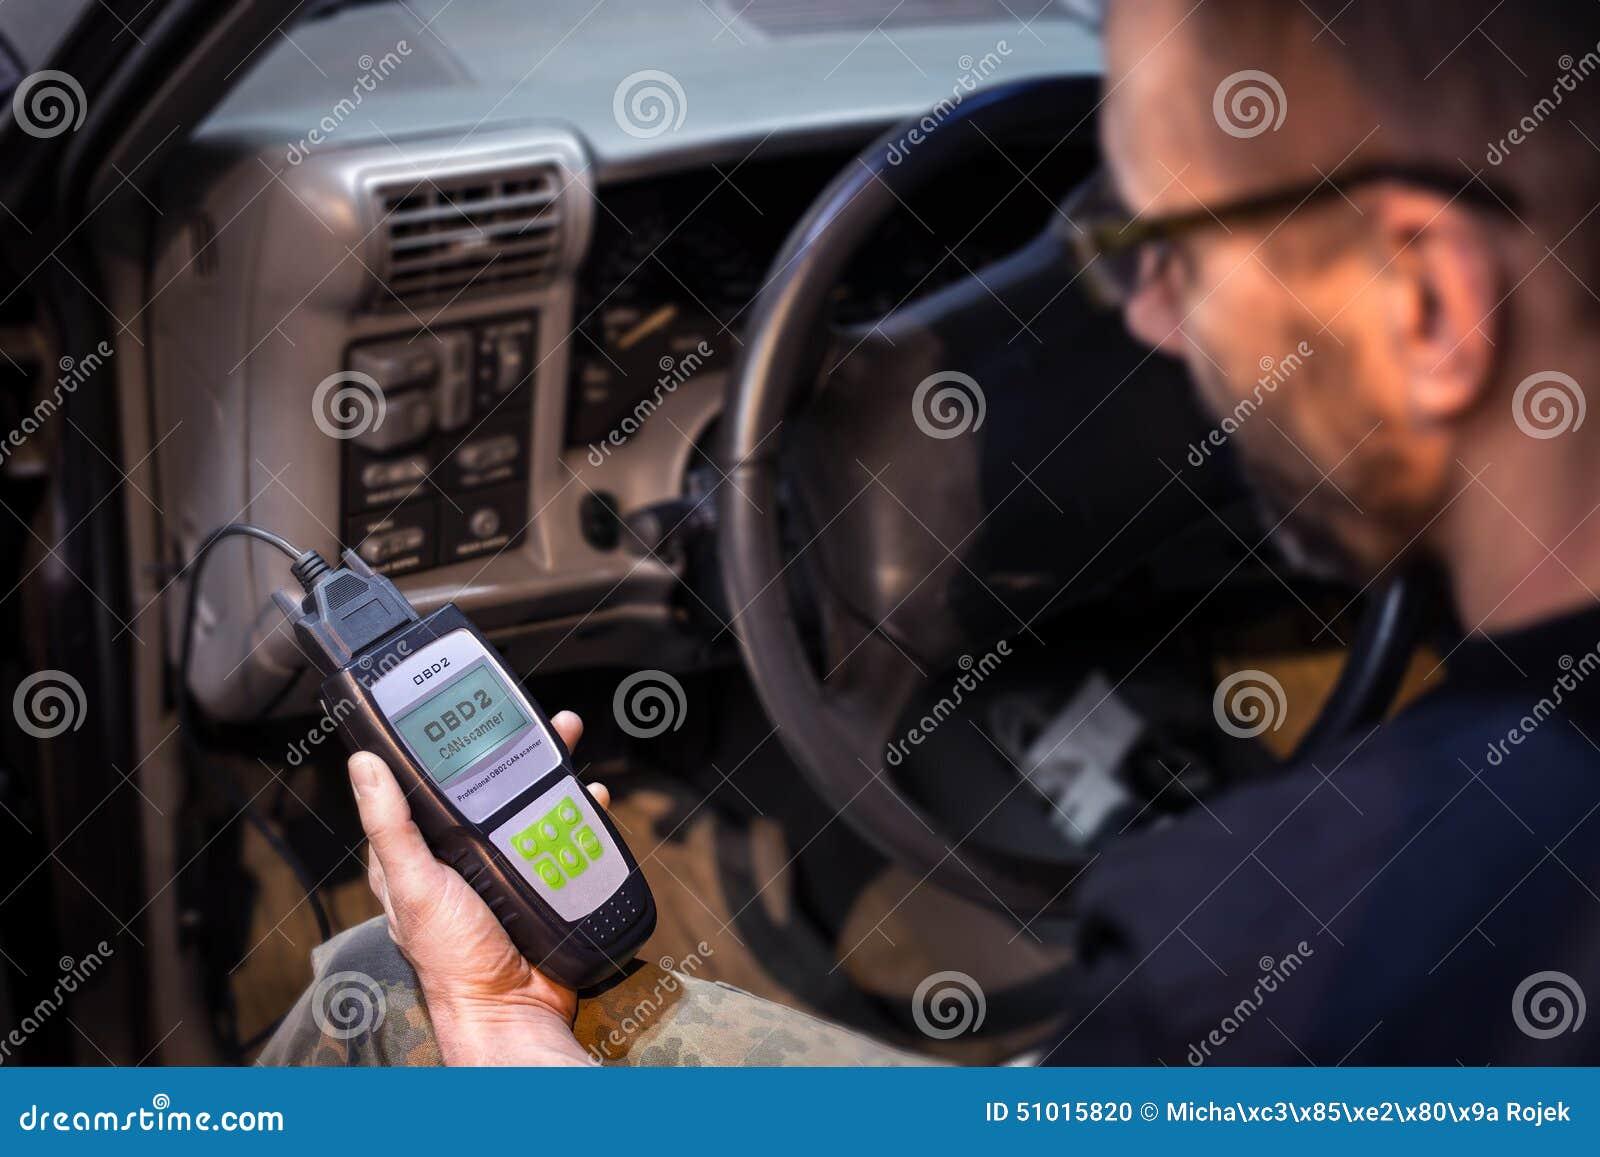 Making car diagnostics using obd device